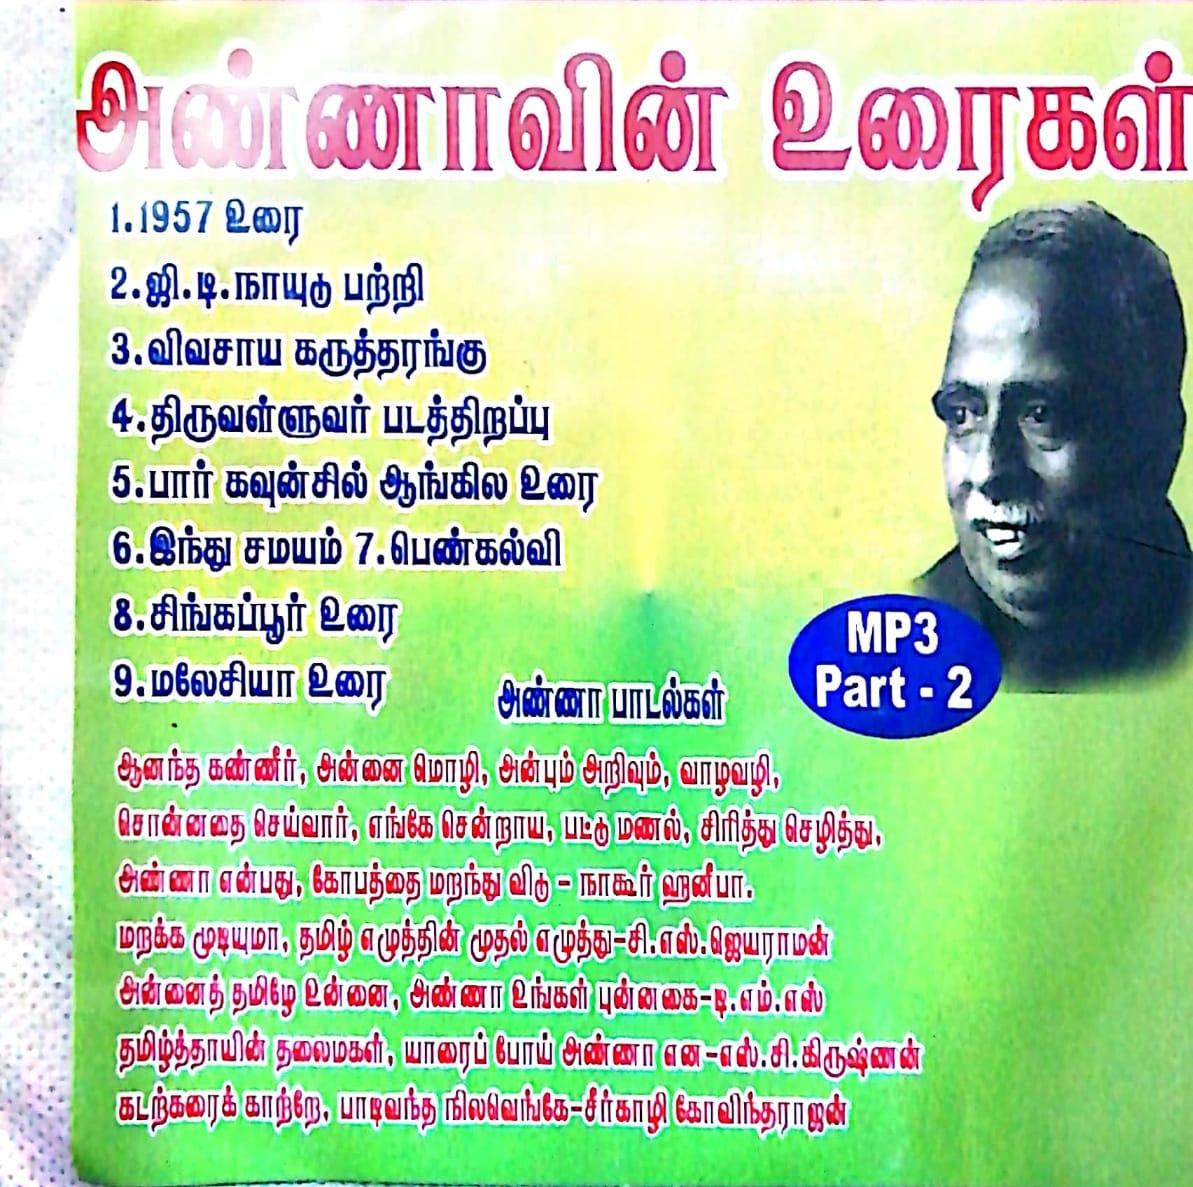 audio talk cd covers_4